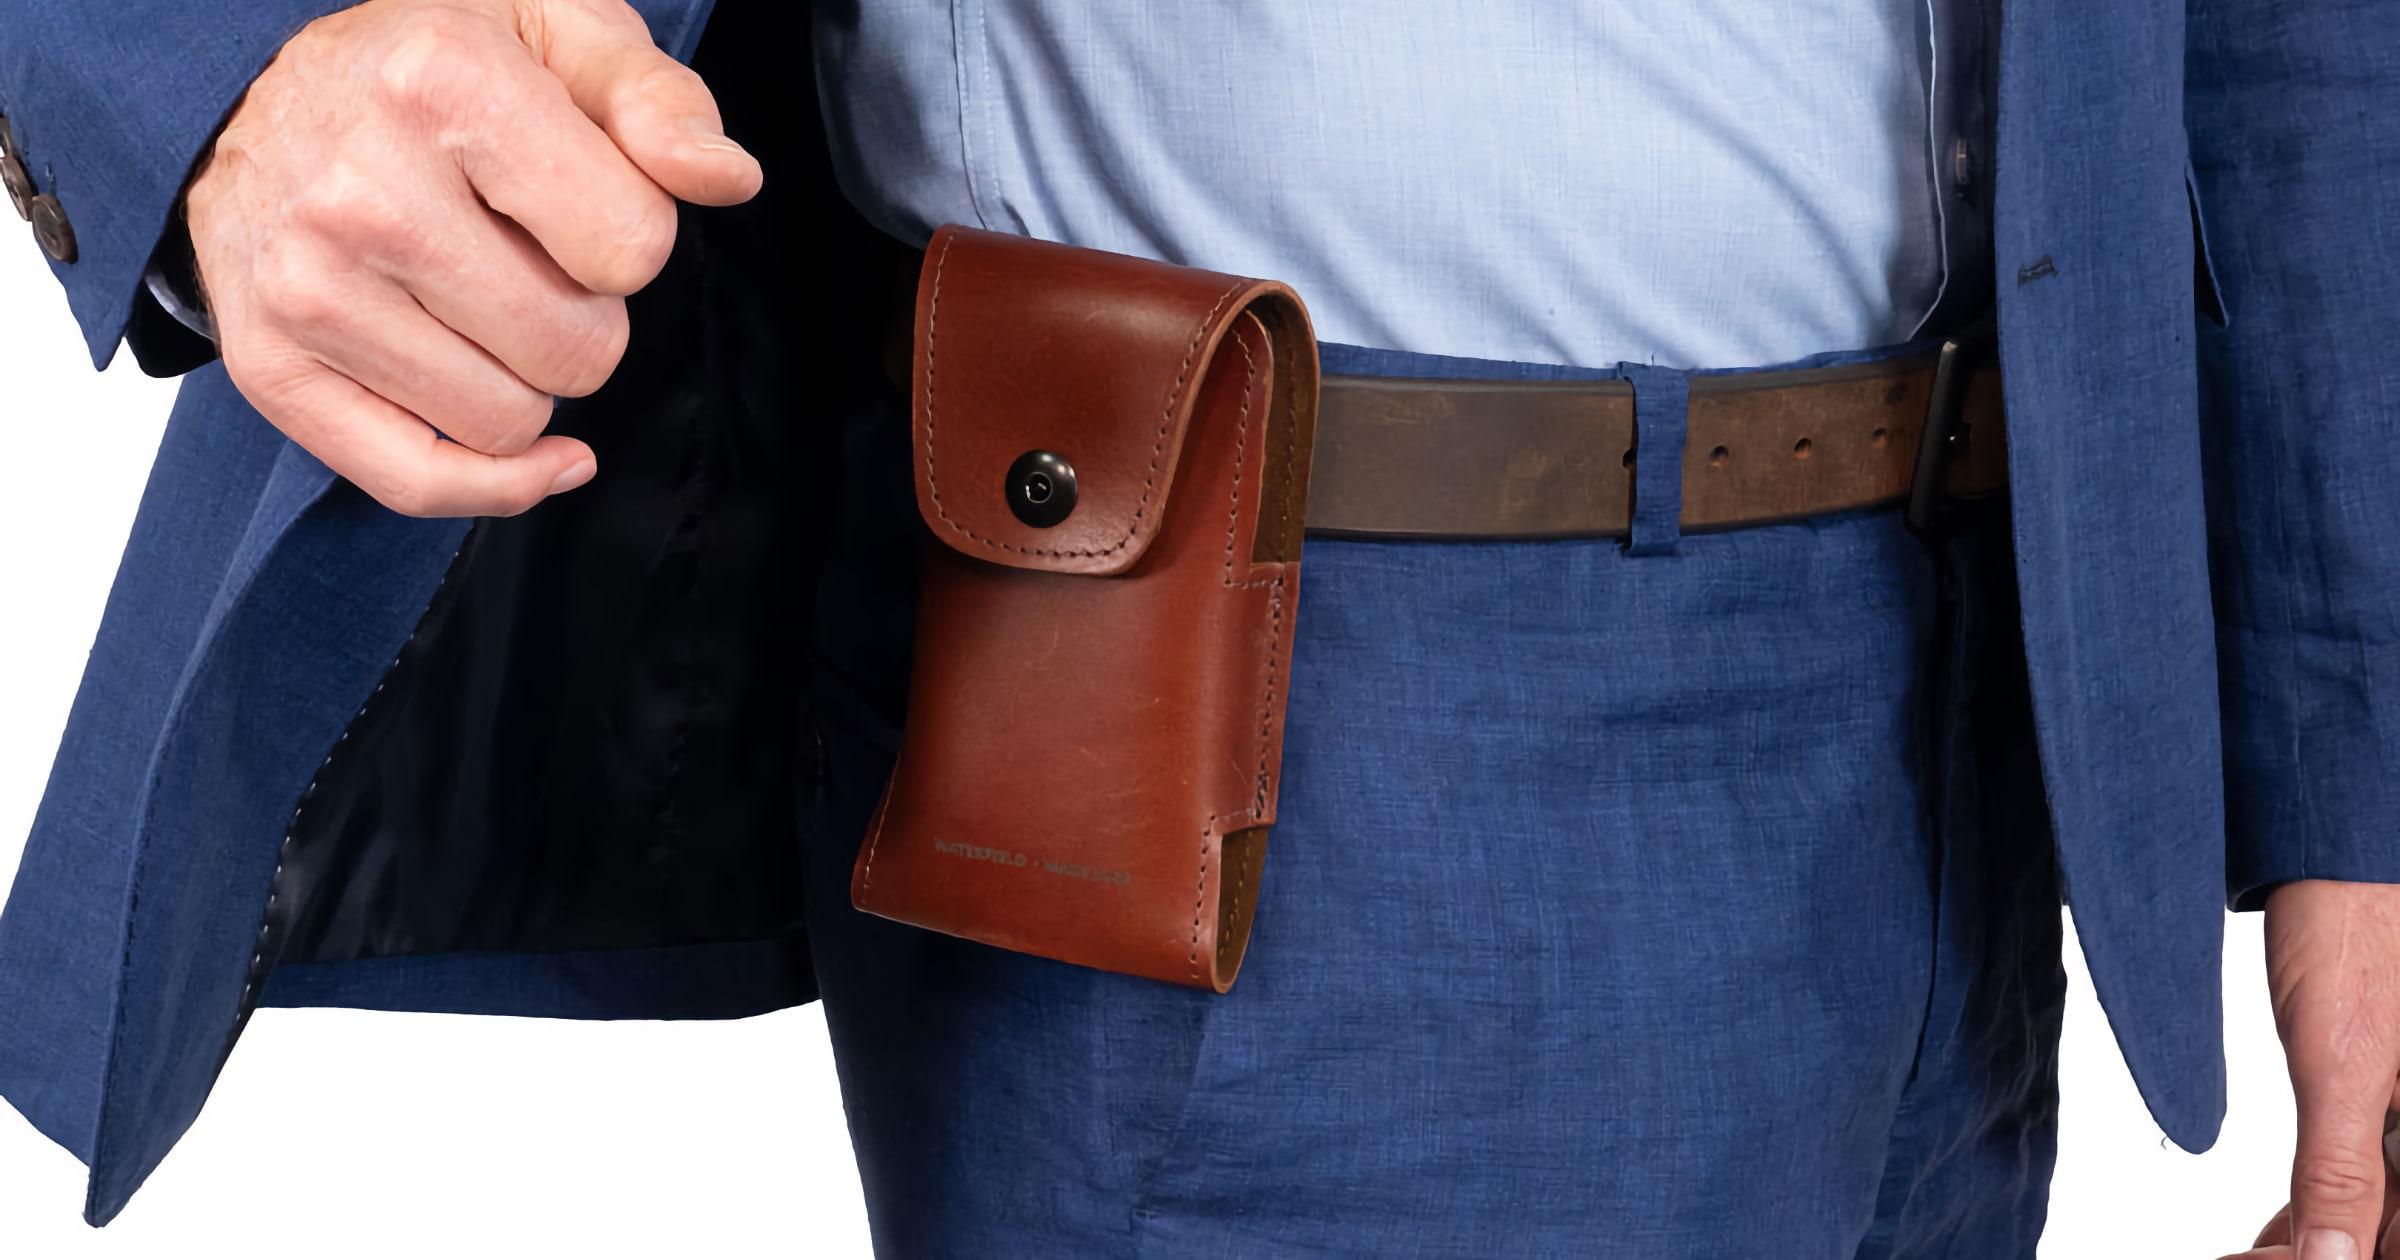 latigo leather iPhone holster